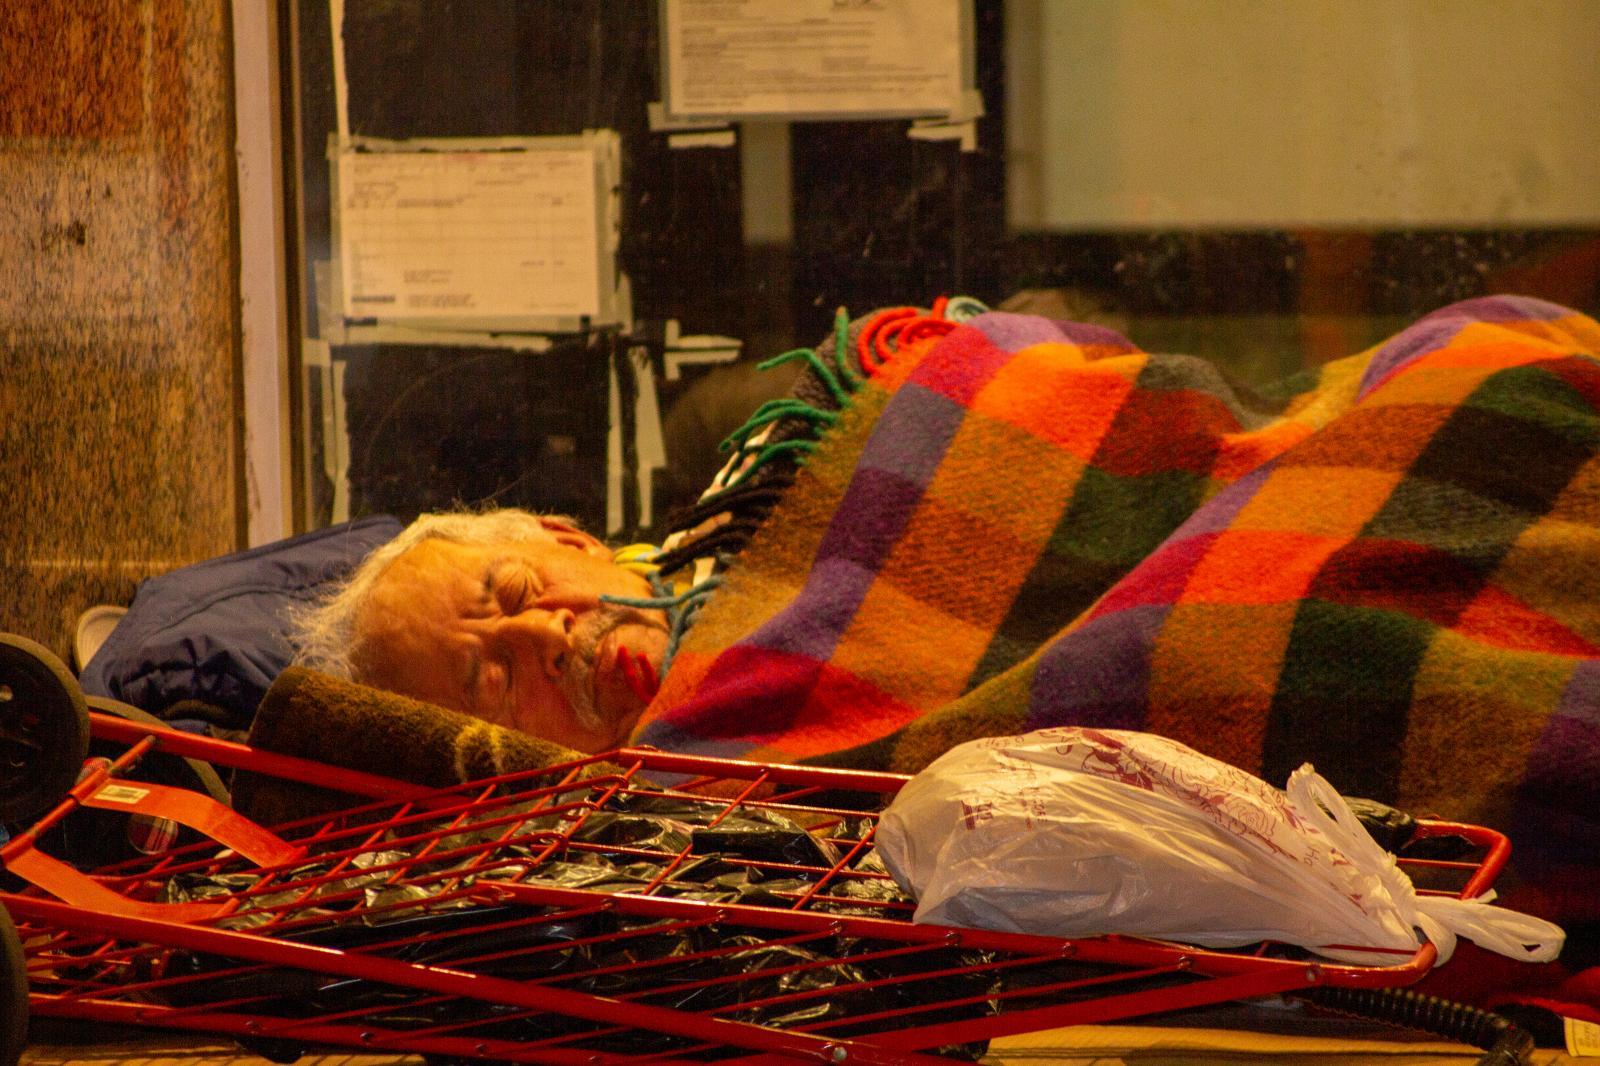 Photography image - Loading Homeless_Man_In_Astoria.jpg